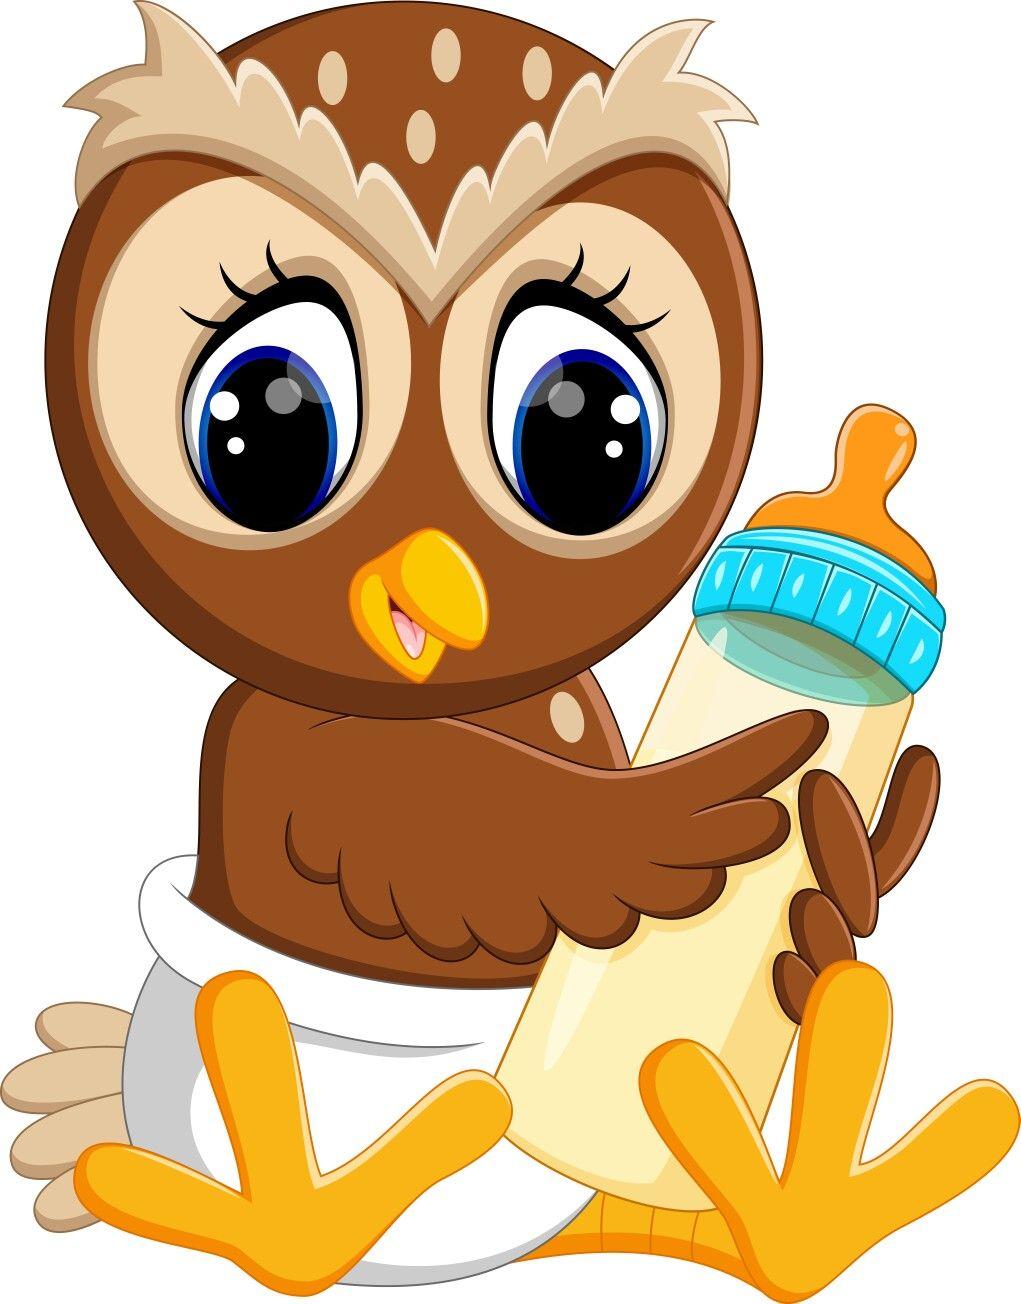 Pin By Re On Template Cute Owl Cartoon Baby Clip Art Baby Cartoon